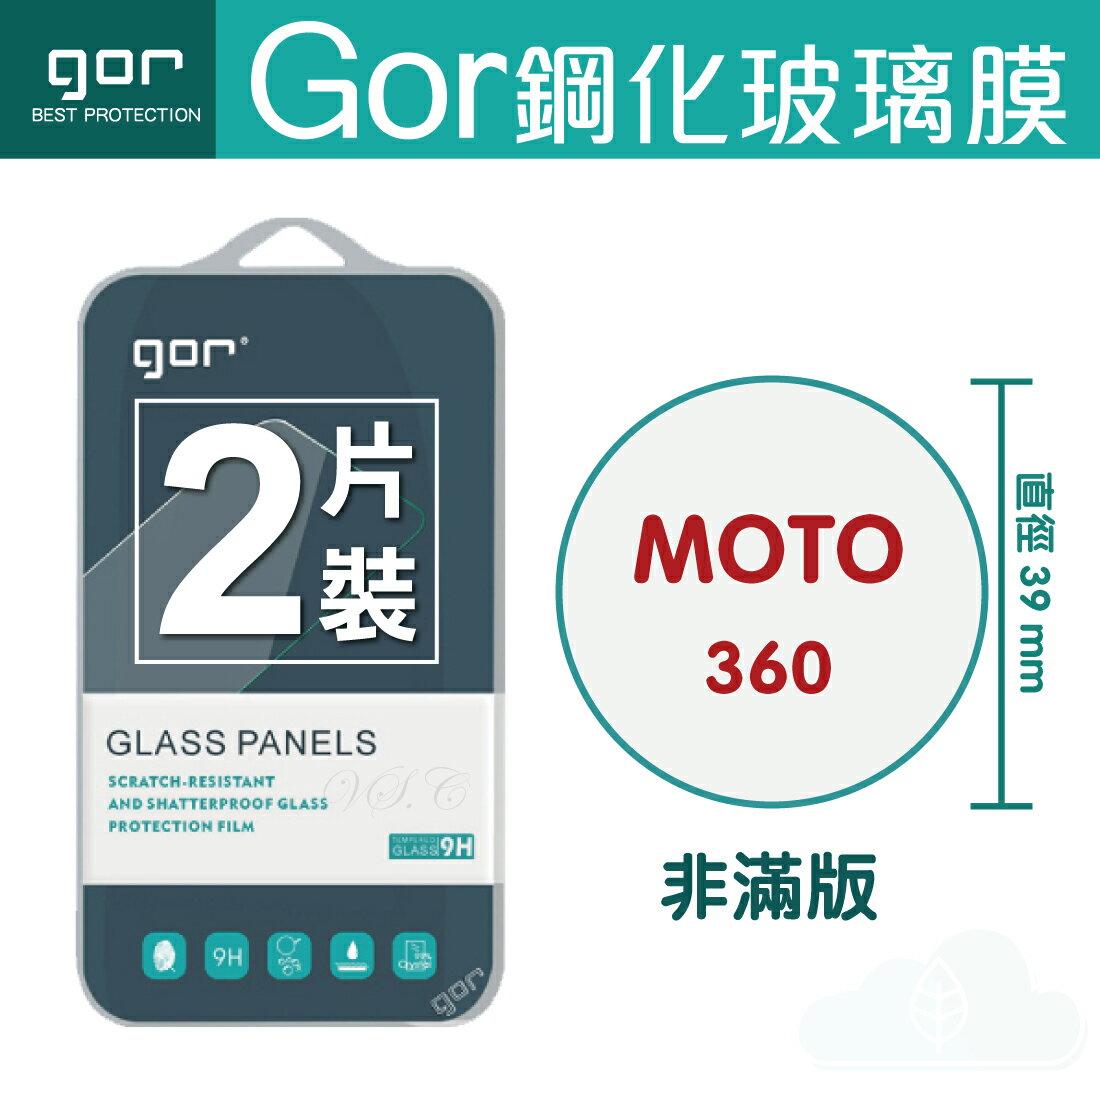 【MOTO】GOR 9H MOTO 360-39mm 智慧 手錶 穿戴裝置 鋼化 玻璃 保護貼 全透明非滿版 兩片裝【全館滿299免運費】 0